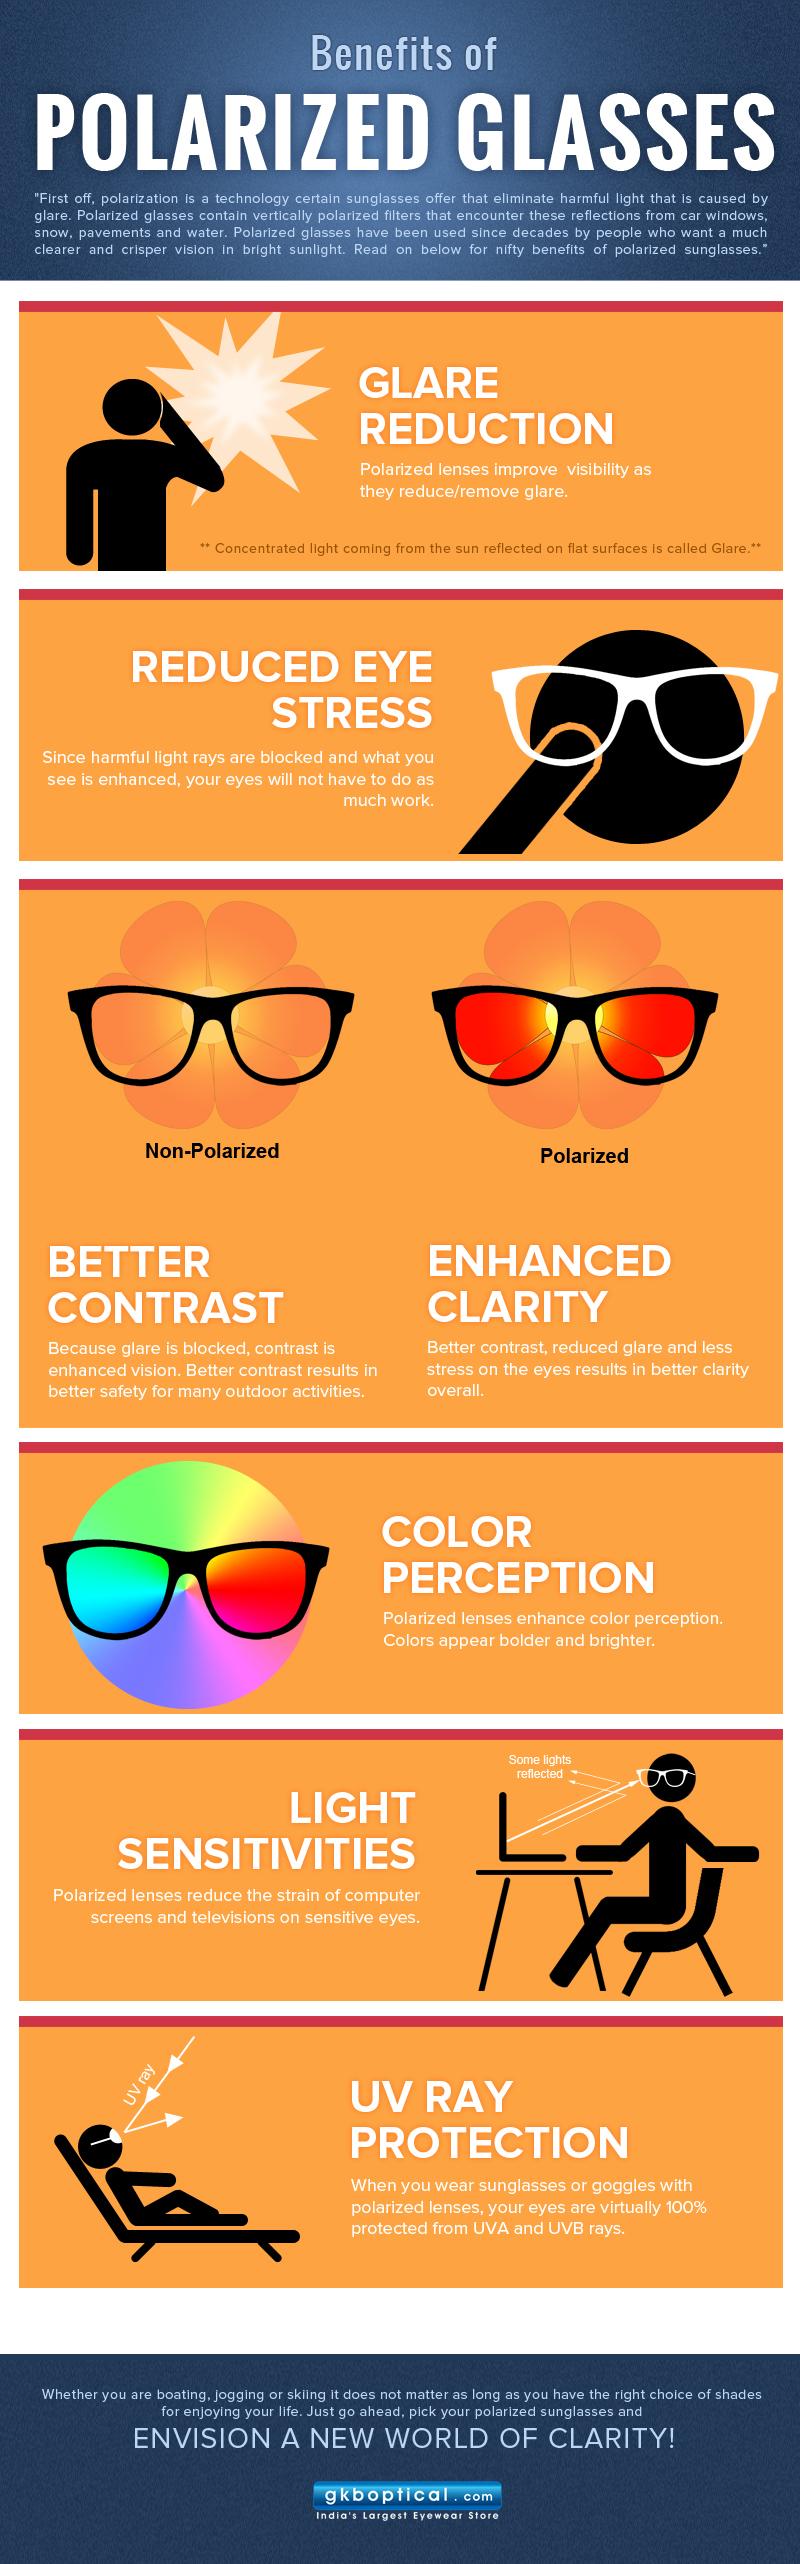 benefits-of-polarized-sunglasses_51e4de53141cb